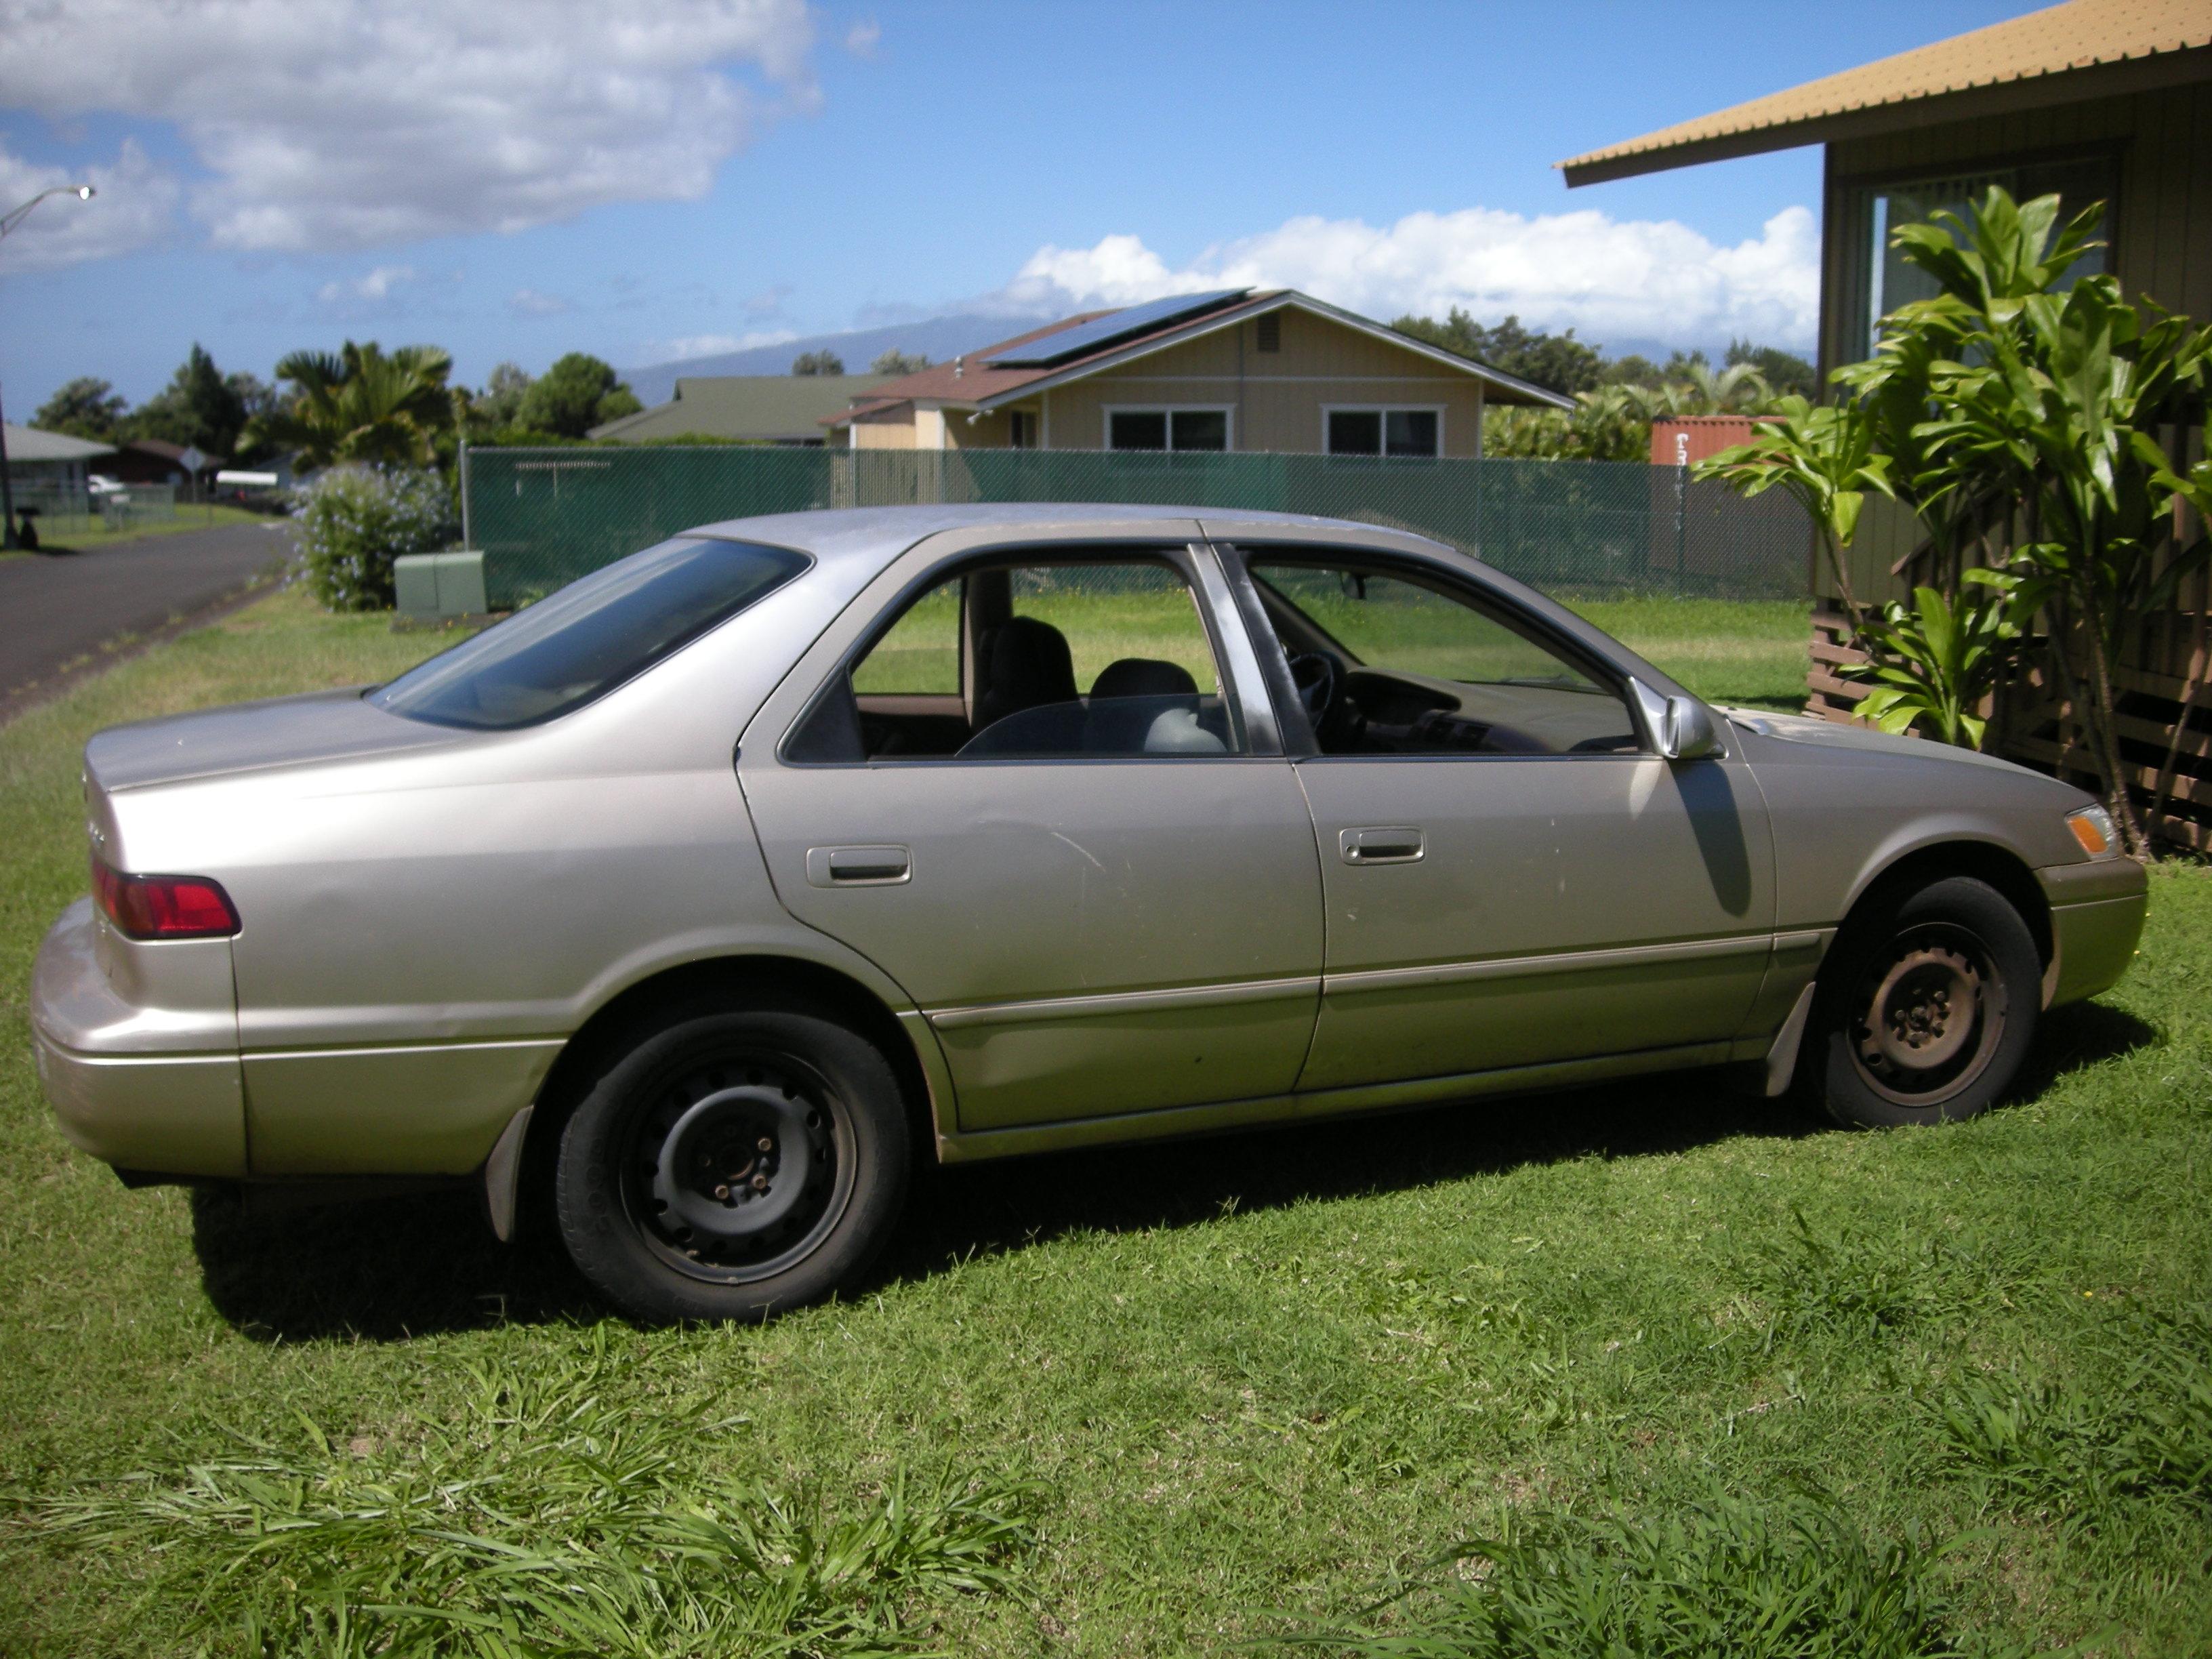 cash for cars oxnard ca sell your junk car the clunker junker. Black Bedroom Furniture Sets. Home Design Ideas